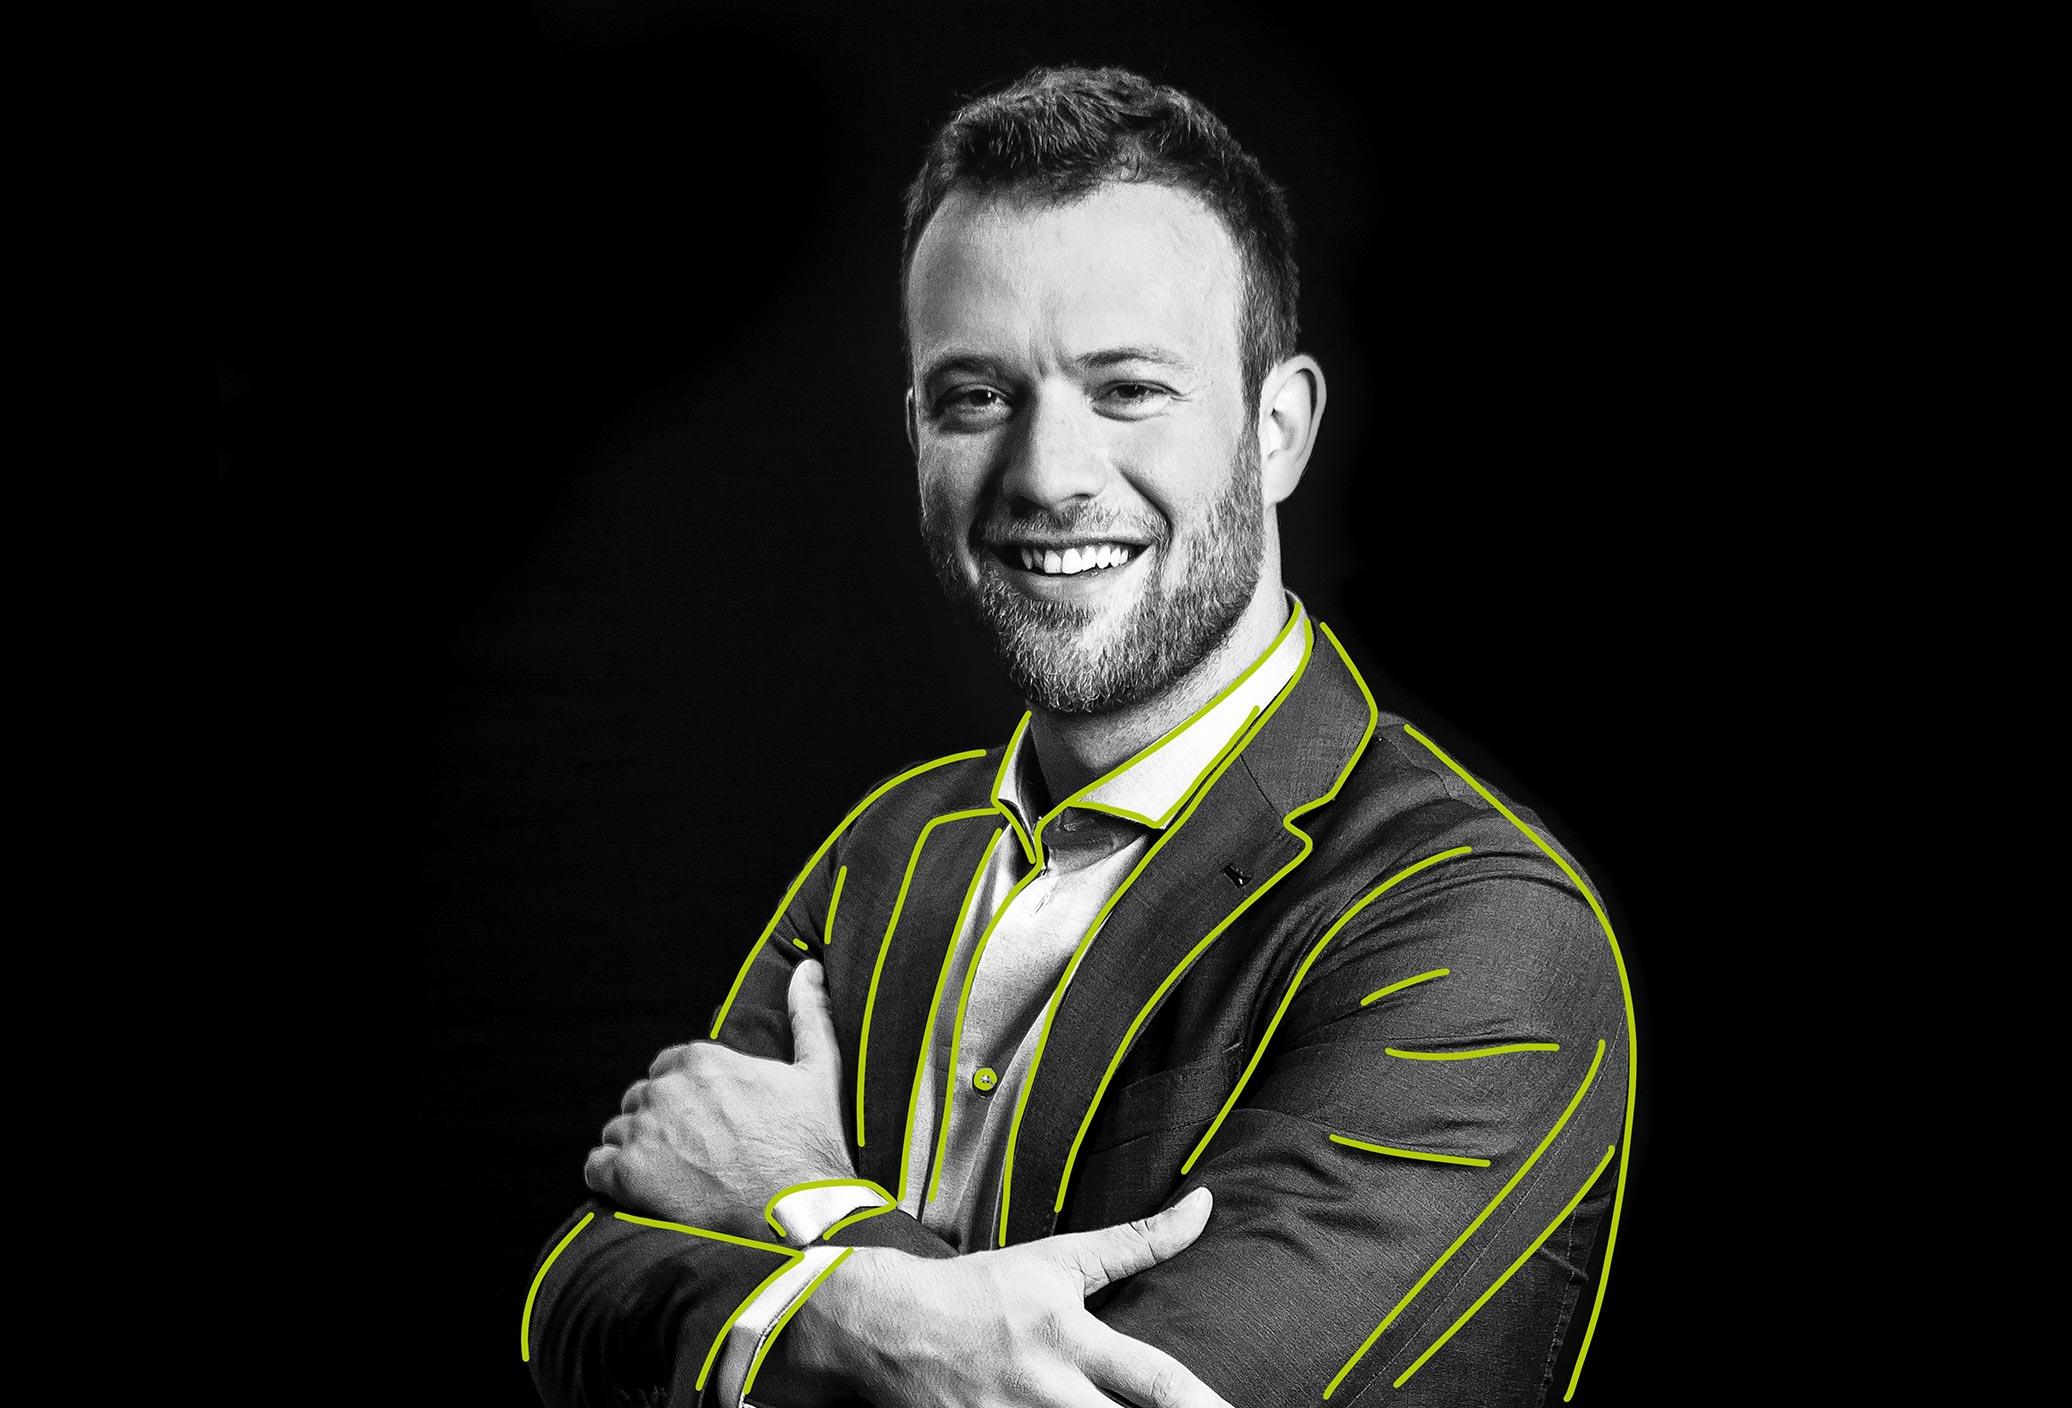 Christian Schad - ACCENON Prokurist & Business Development Manager